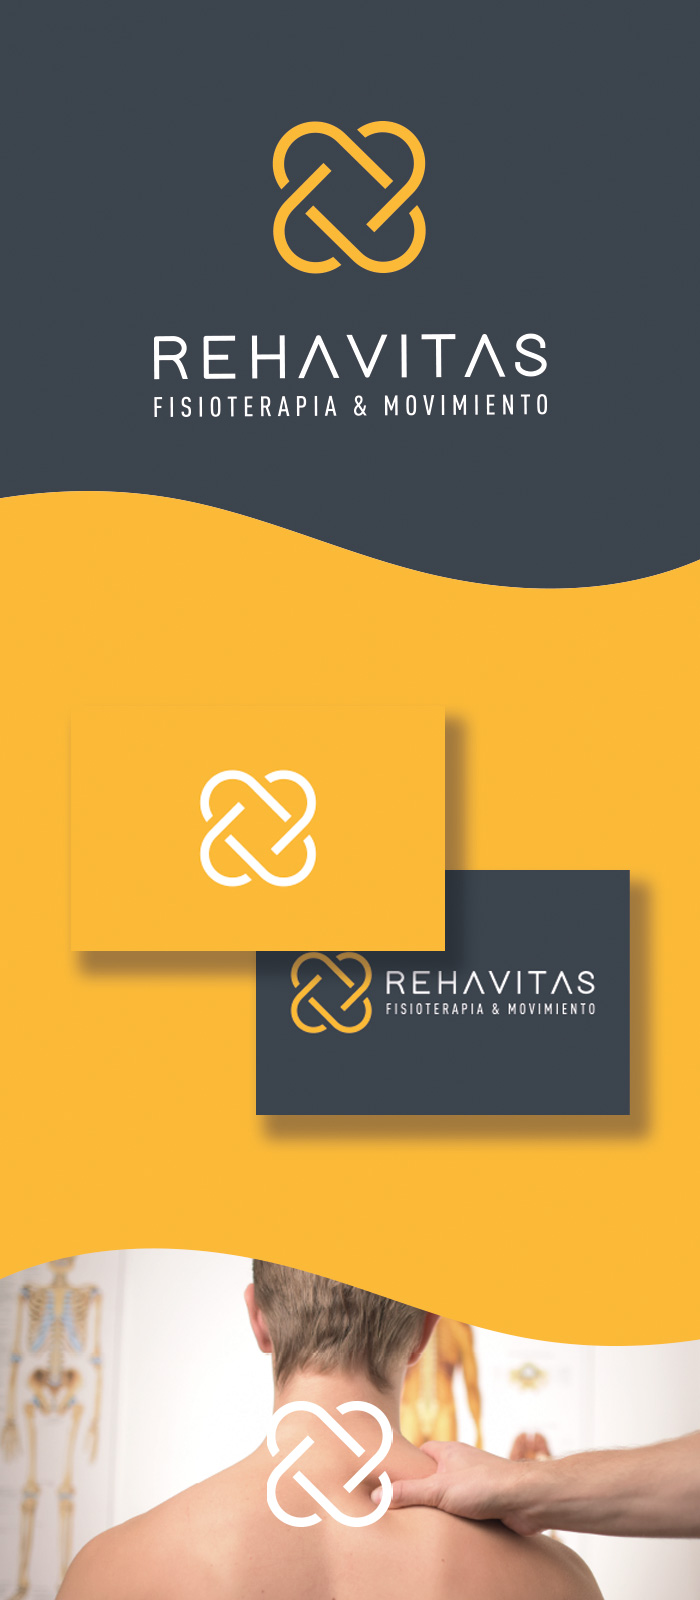 rehavitas_factoryfy_academy